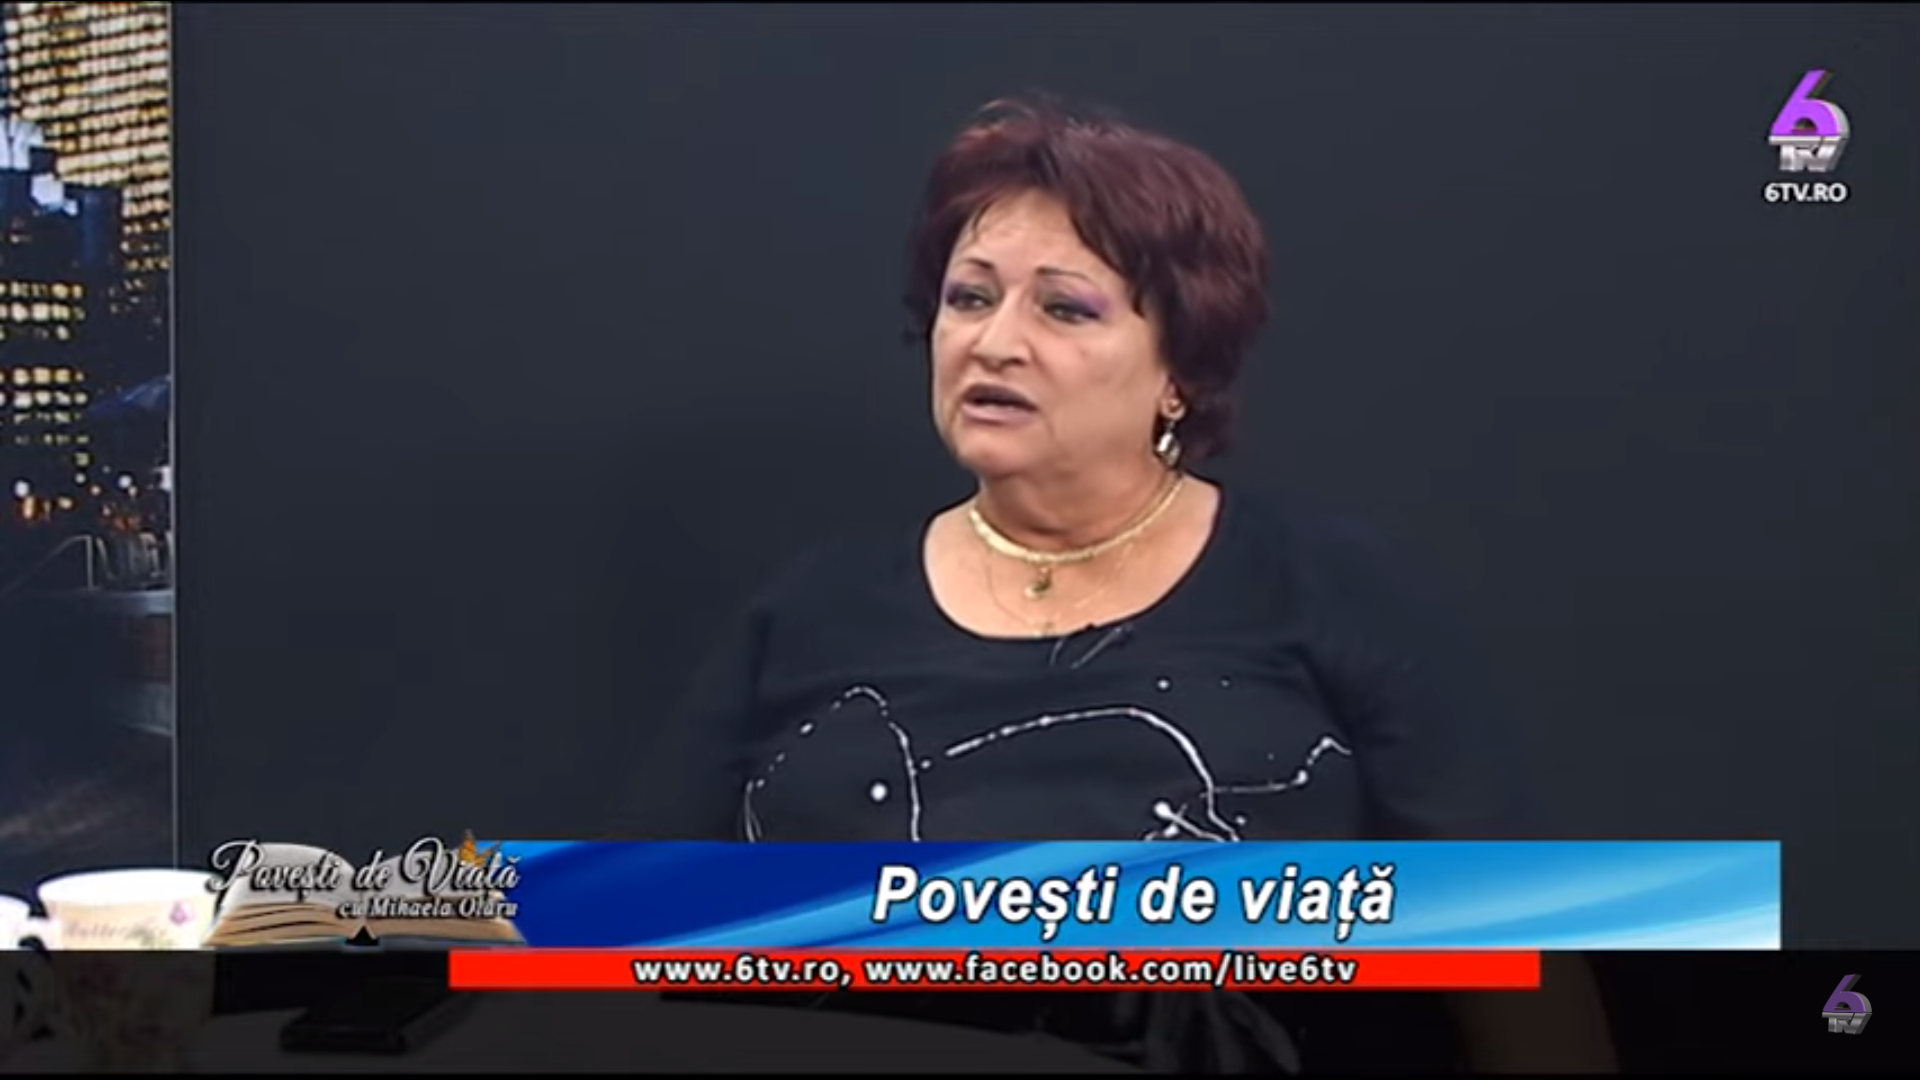 29. Prof Univ. Dr. Monica Pop